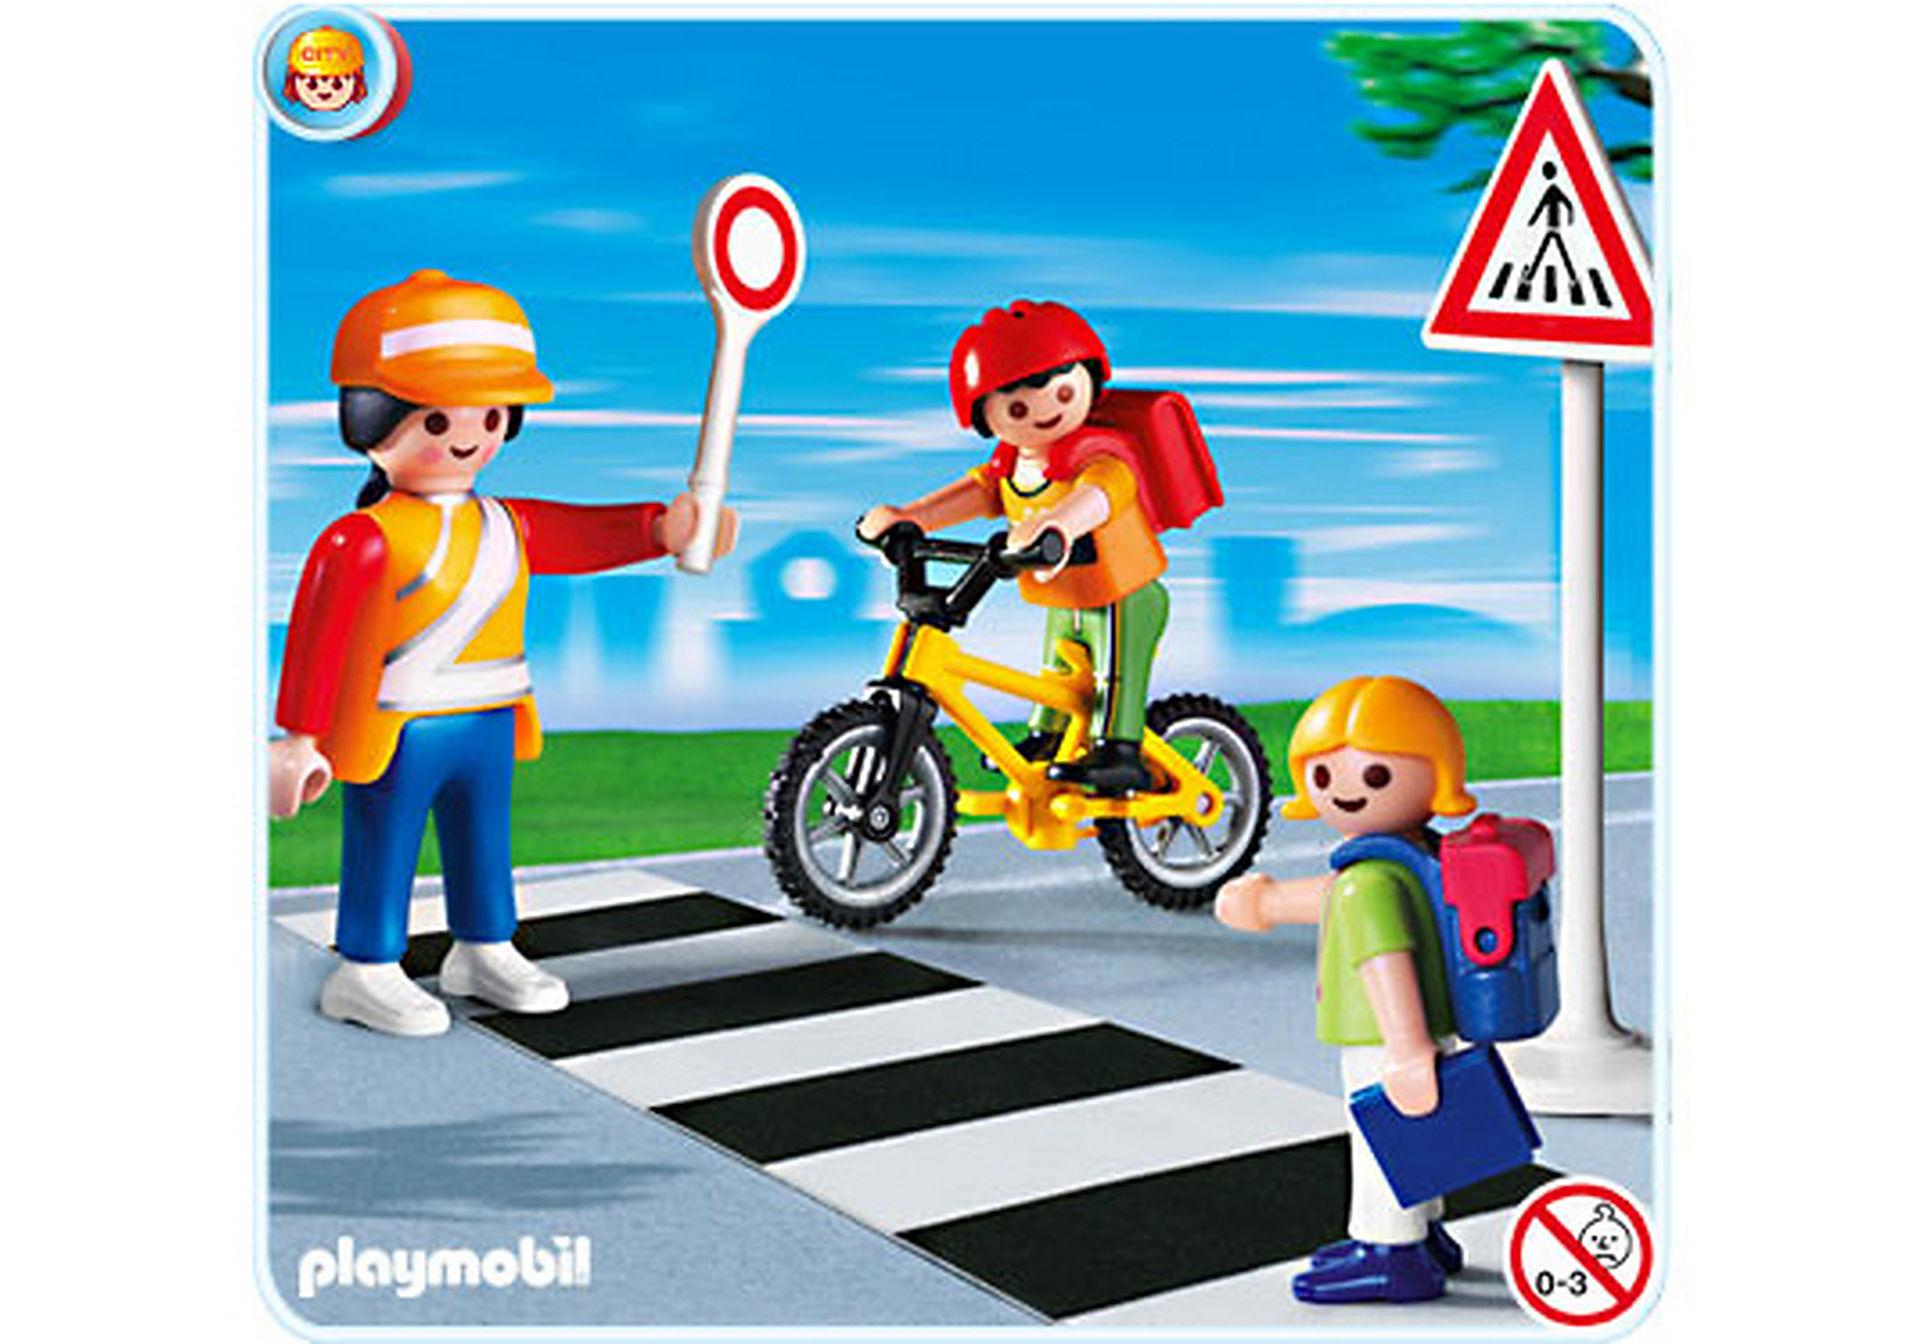 http://media.playmobil.com/i/playmobil/4328-A_product_detail/Schulweghelferin mit Kindern